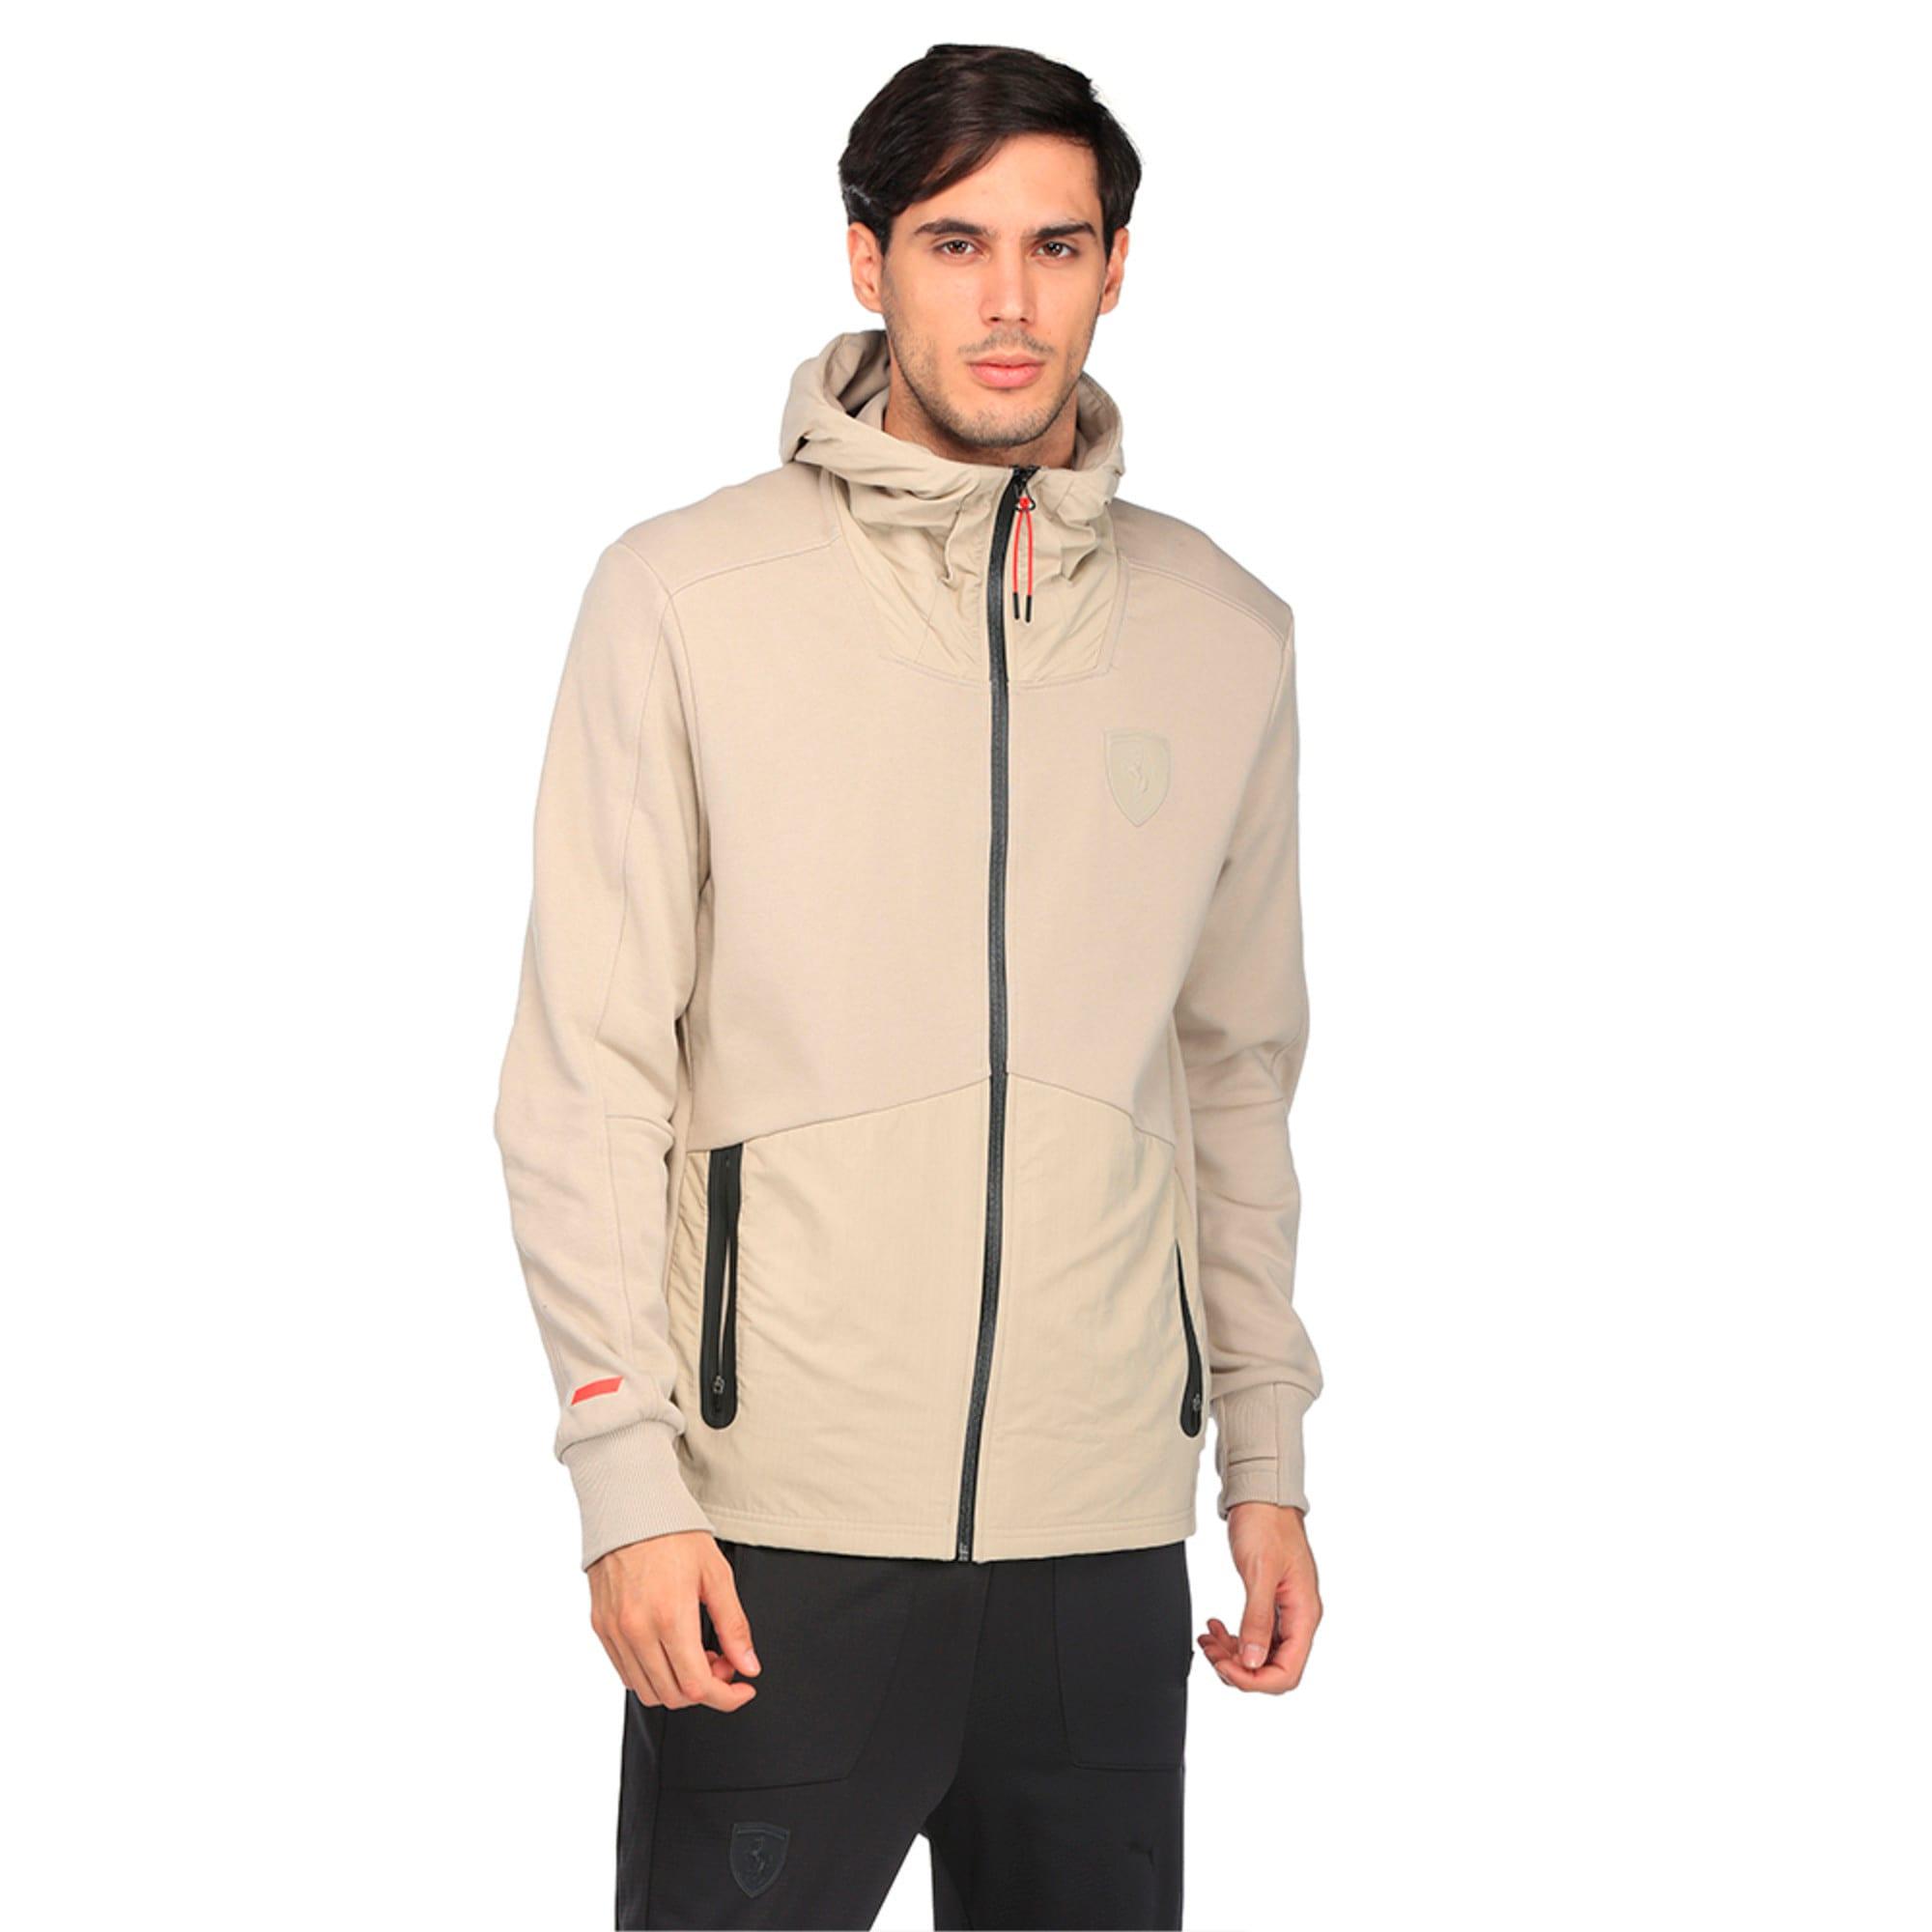 Thumbnail 1 of Ferrari Lifestyle Men's Hooded Sweat Jacket, Pure Cashmere, medium-IND